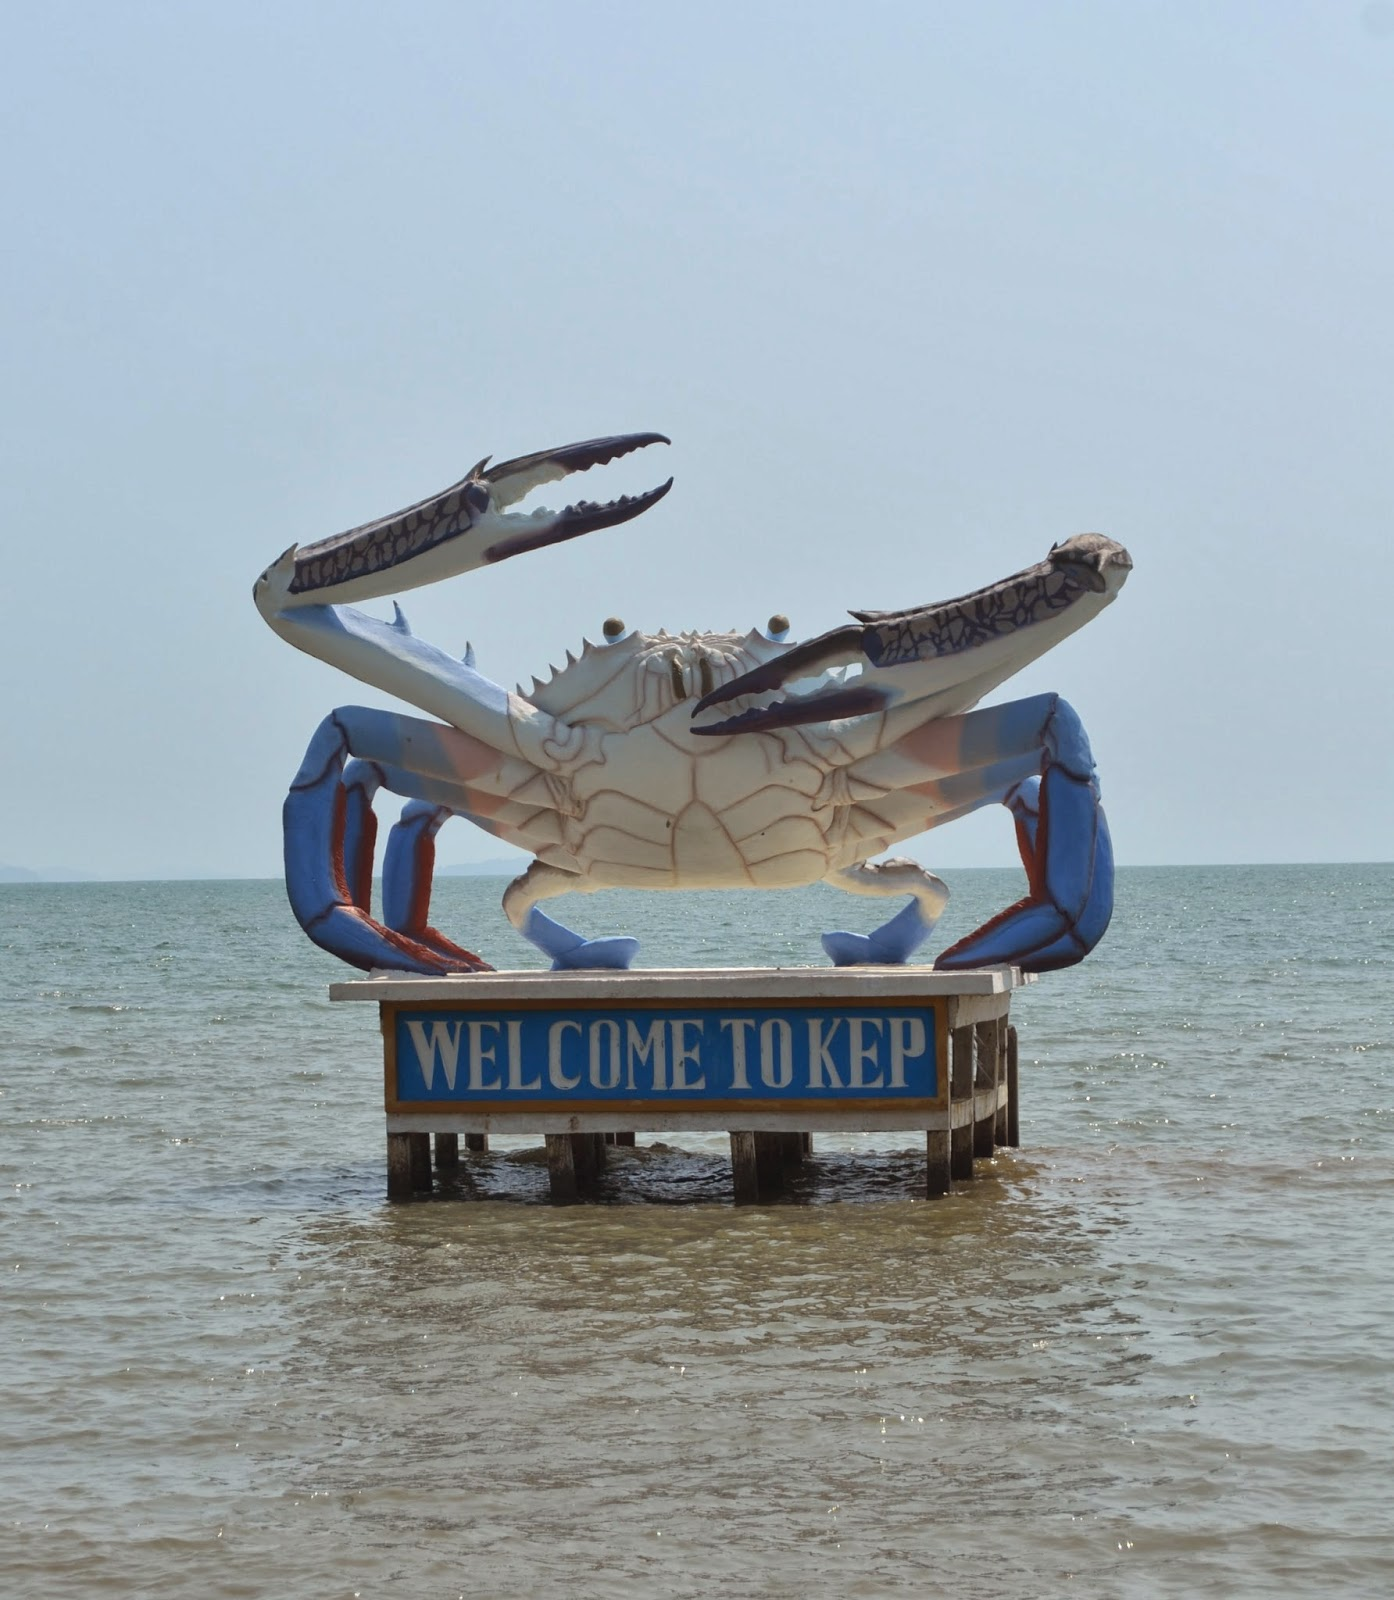 kep crab cambodia